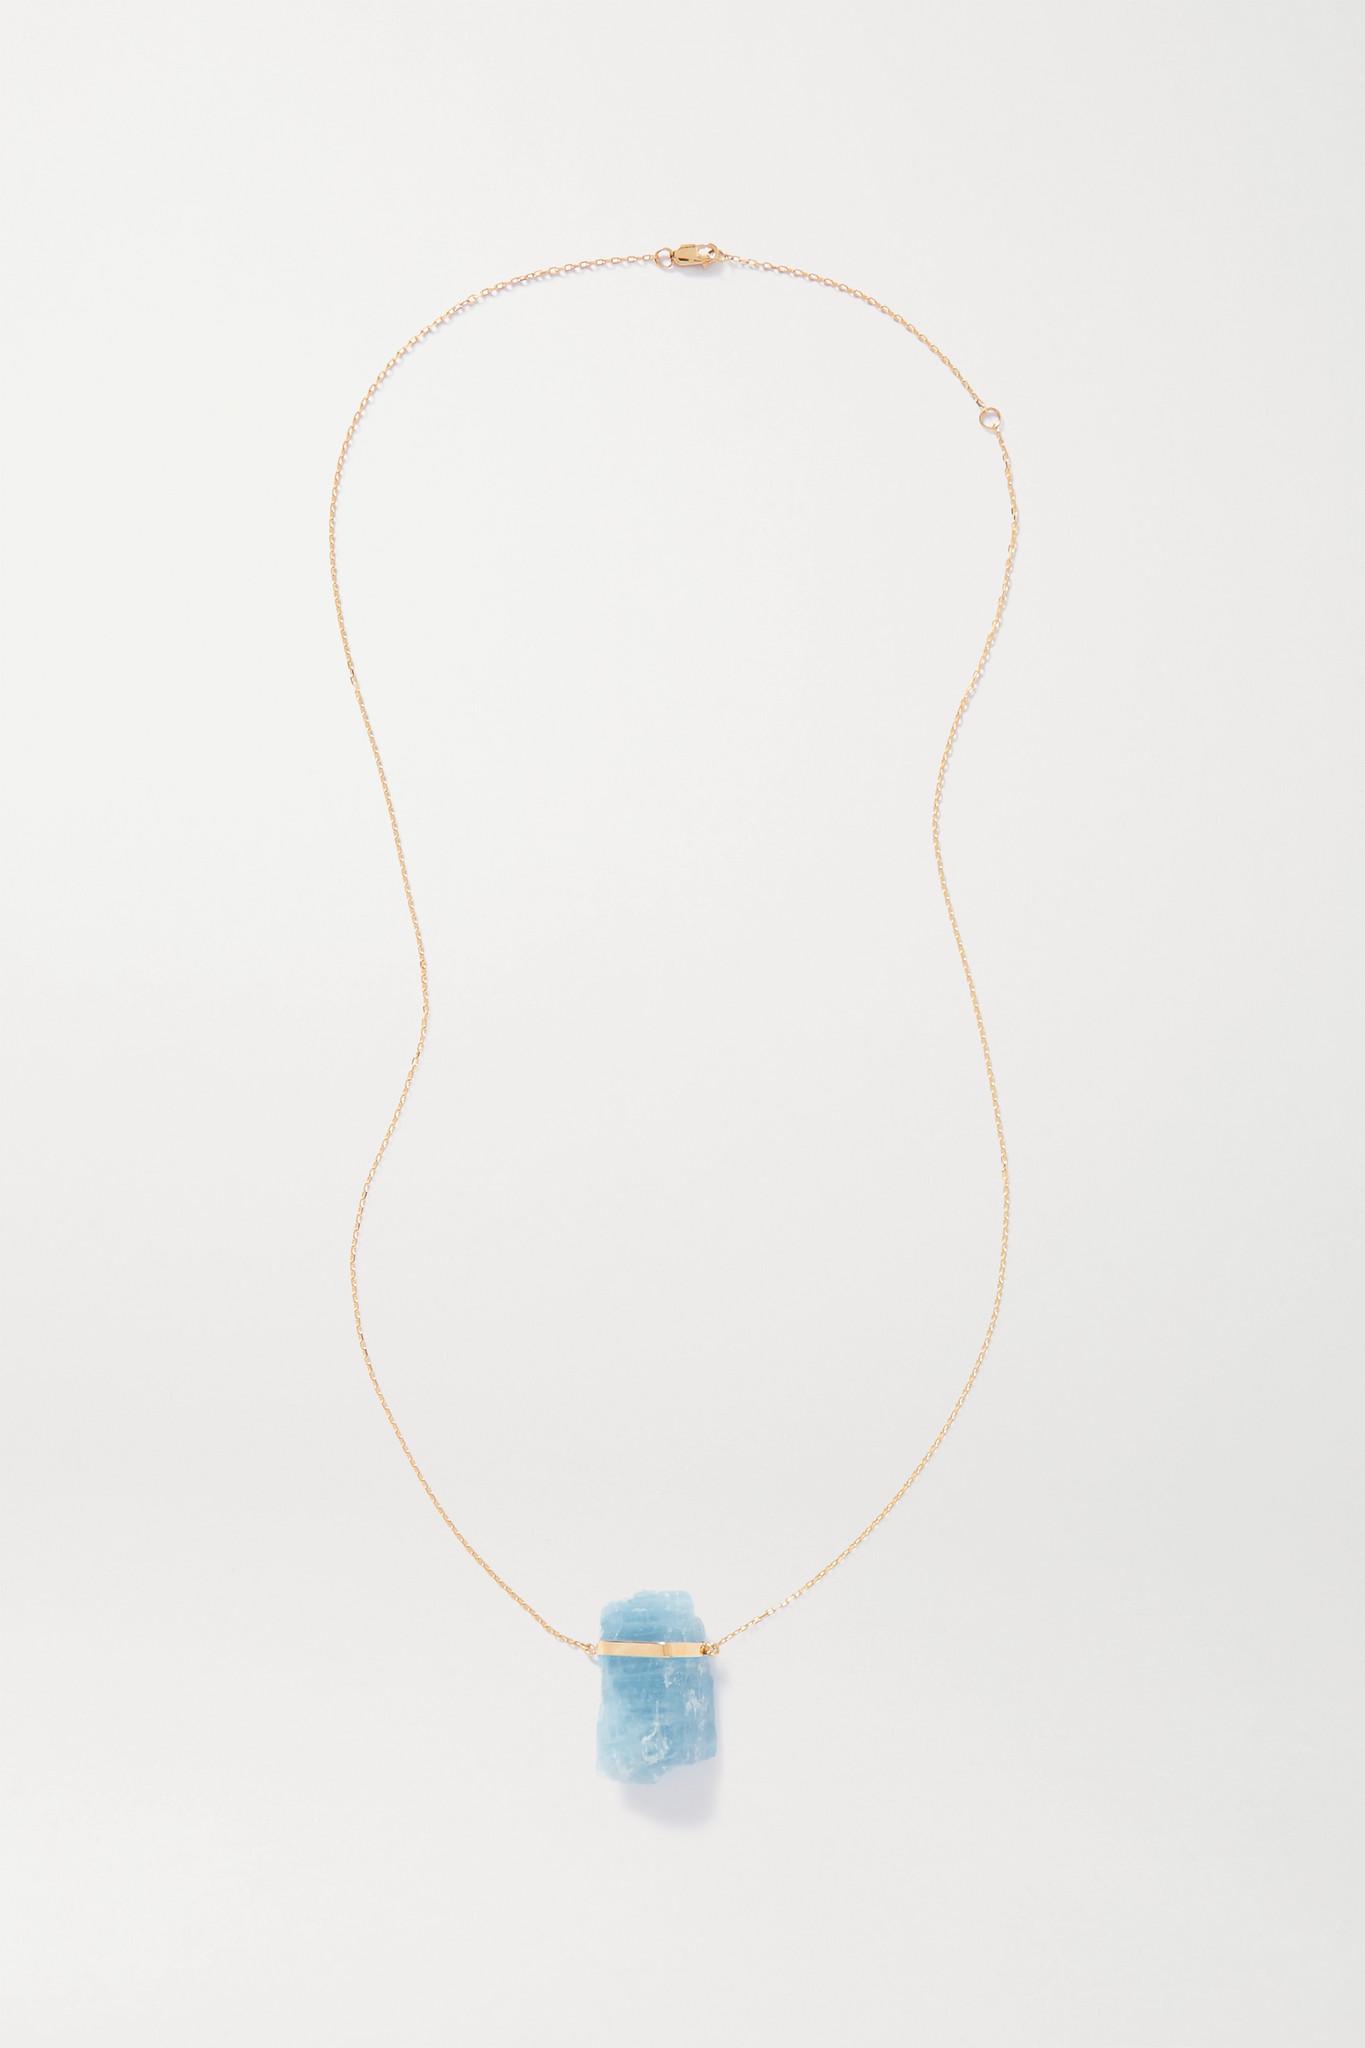 JIA JIA - 14-karat Gold Aquamarine Necklace - Blue - one size